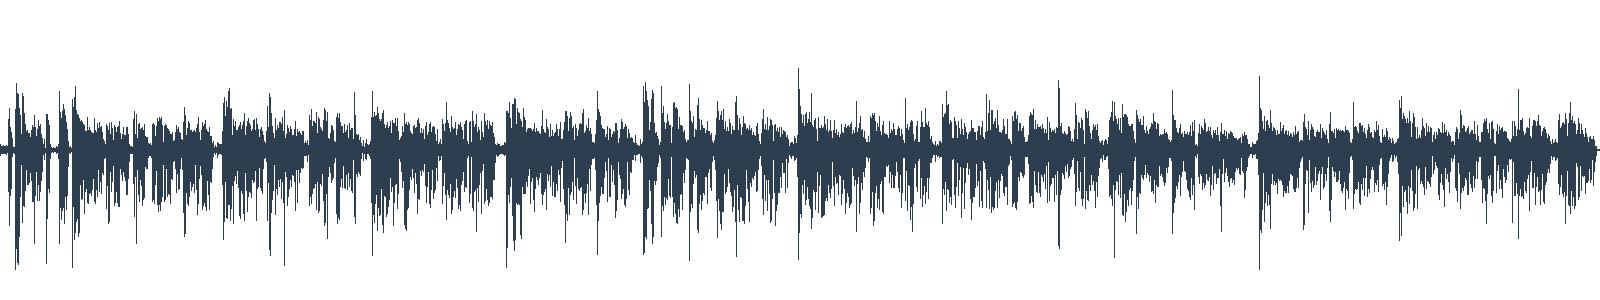 Nové audioknihy 20/2019 waveform